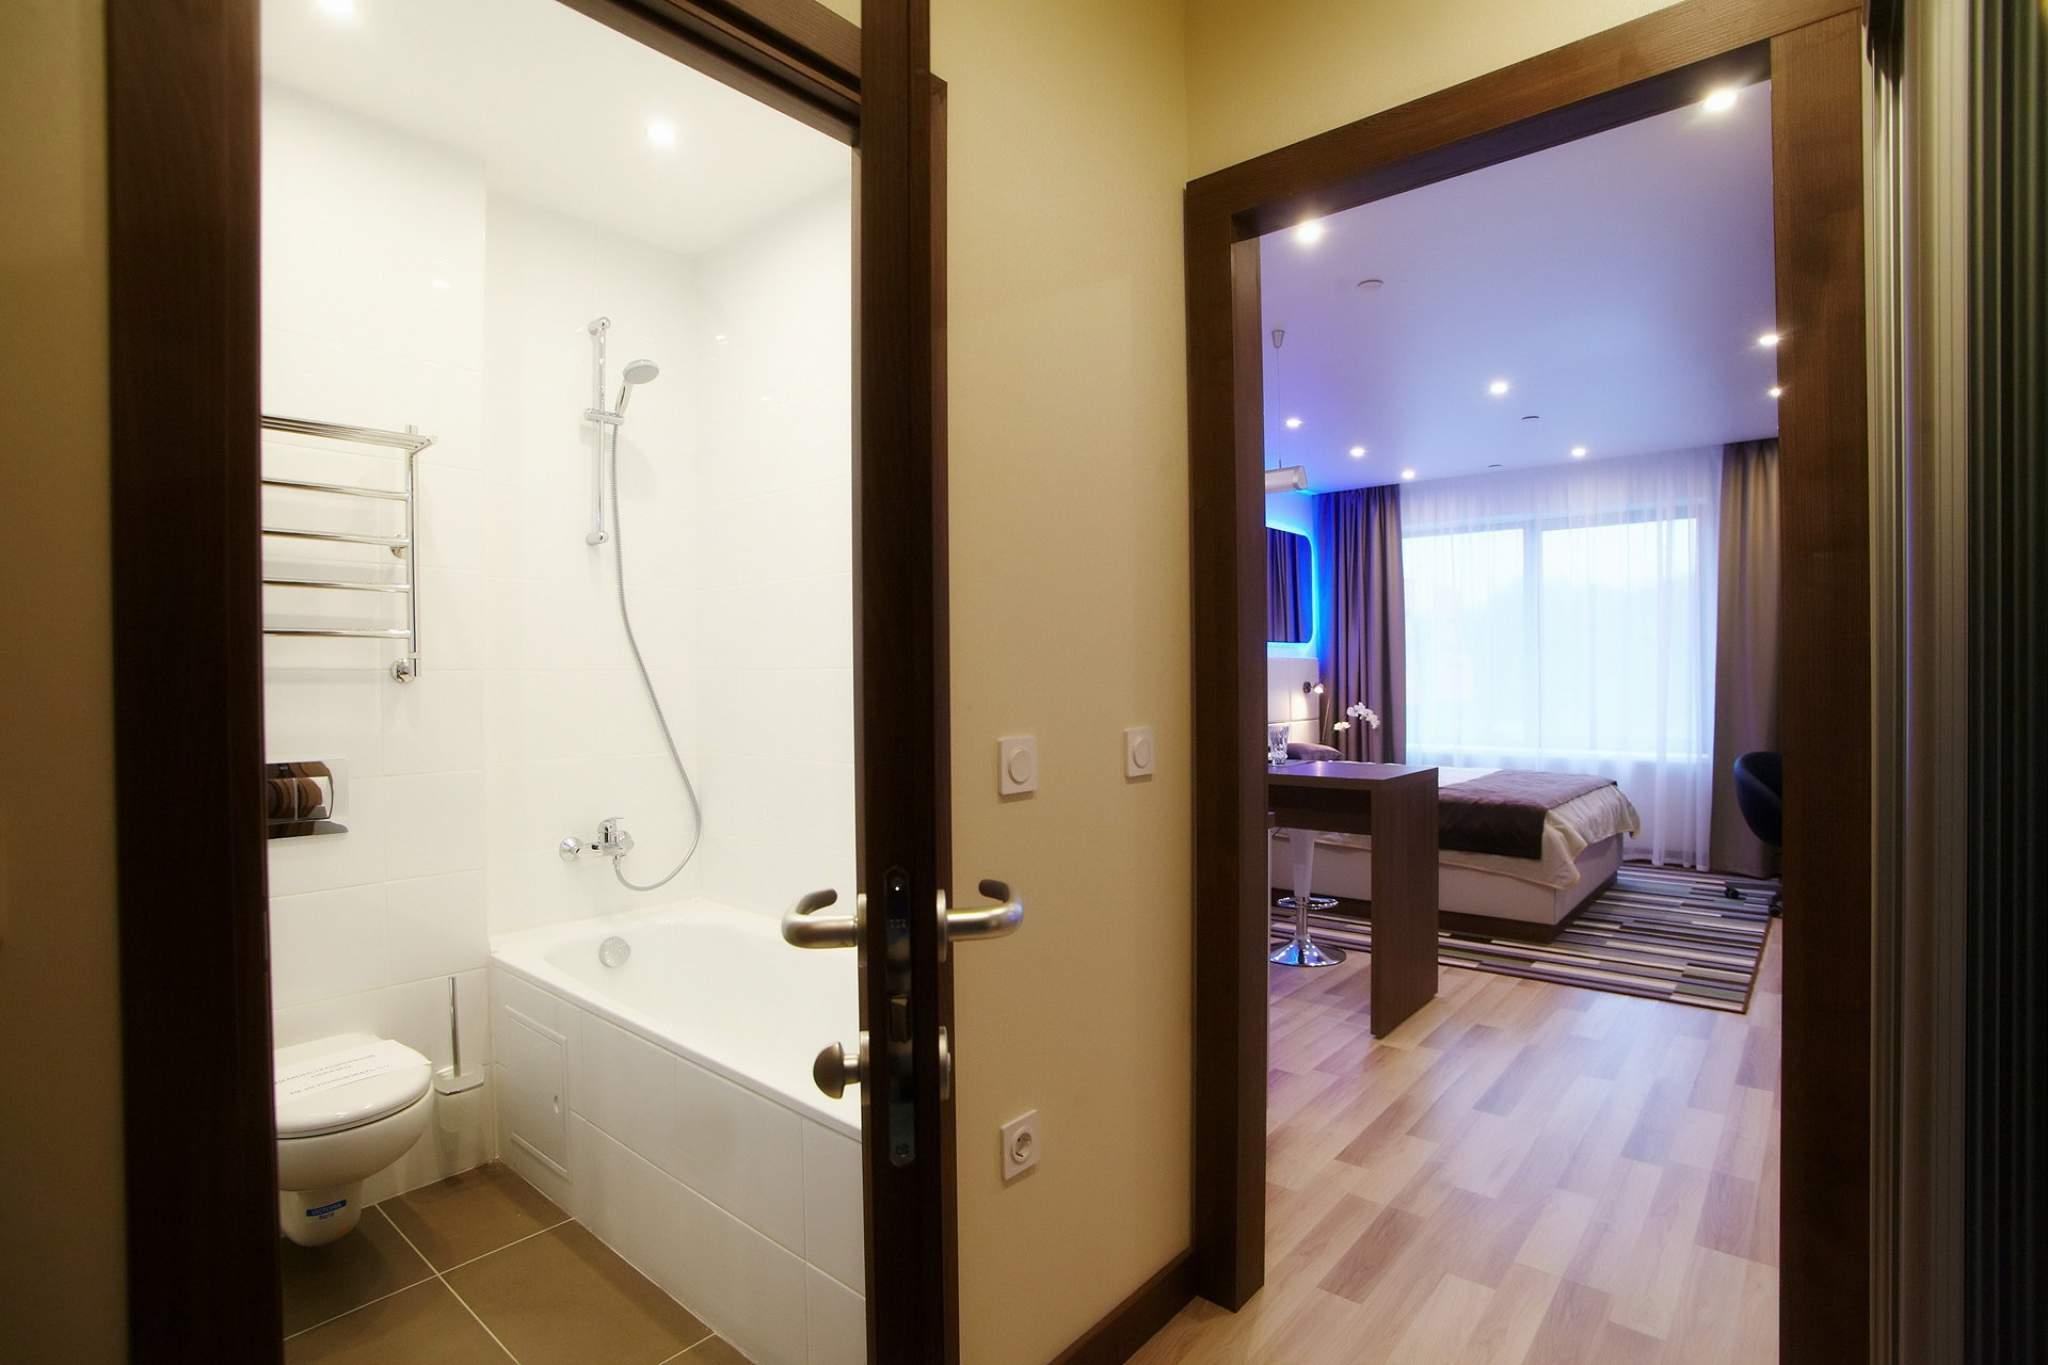 1 комнатная квартира в магдебурге цена